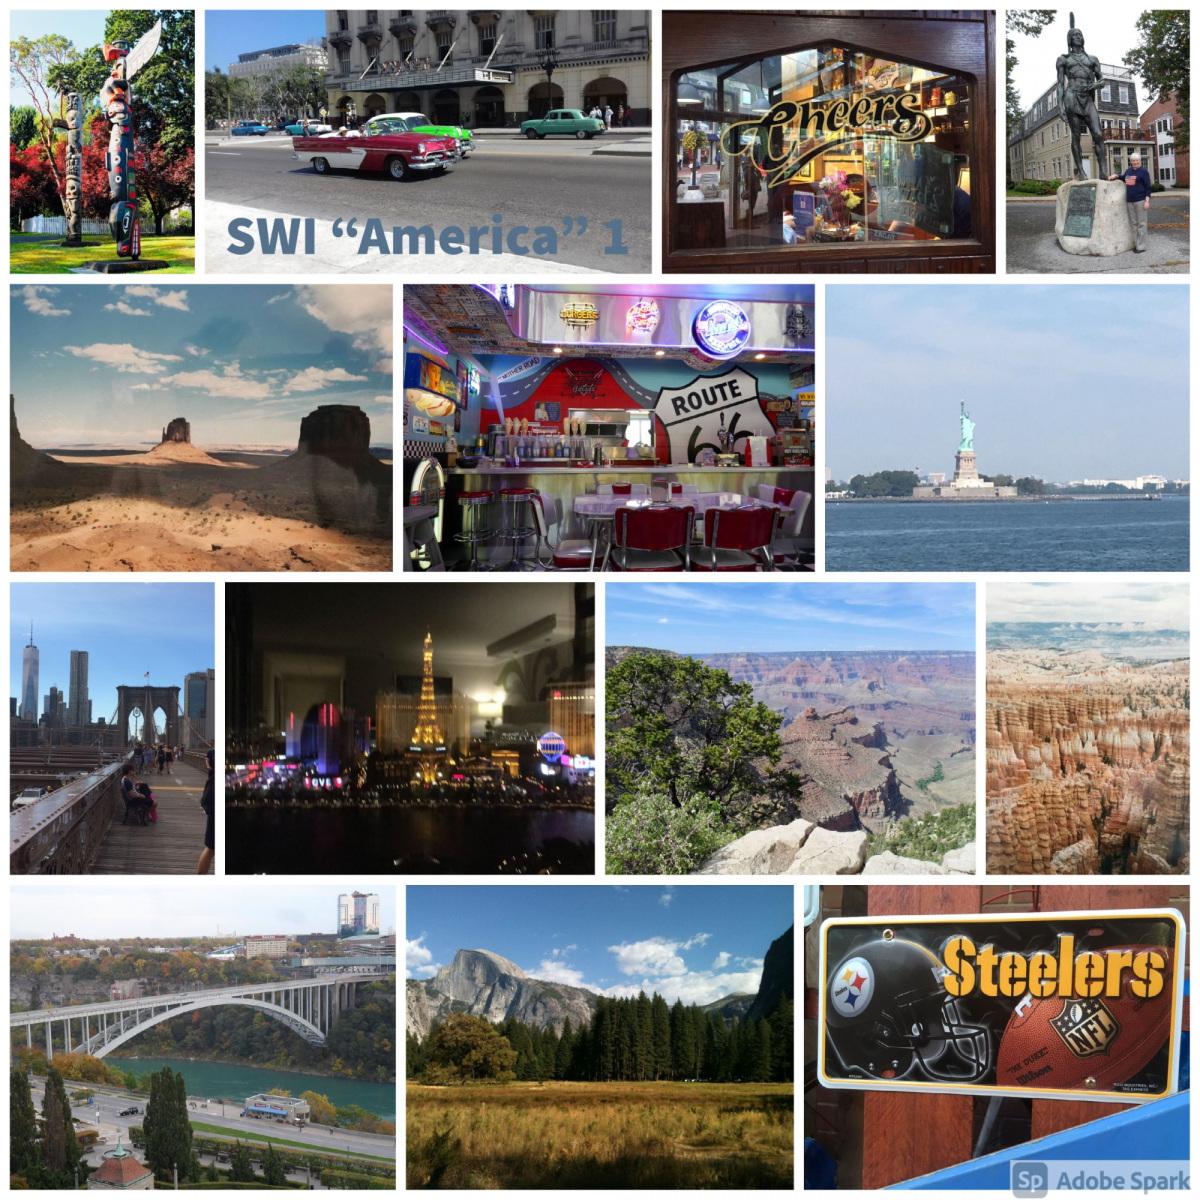 SWI-America-part1